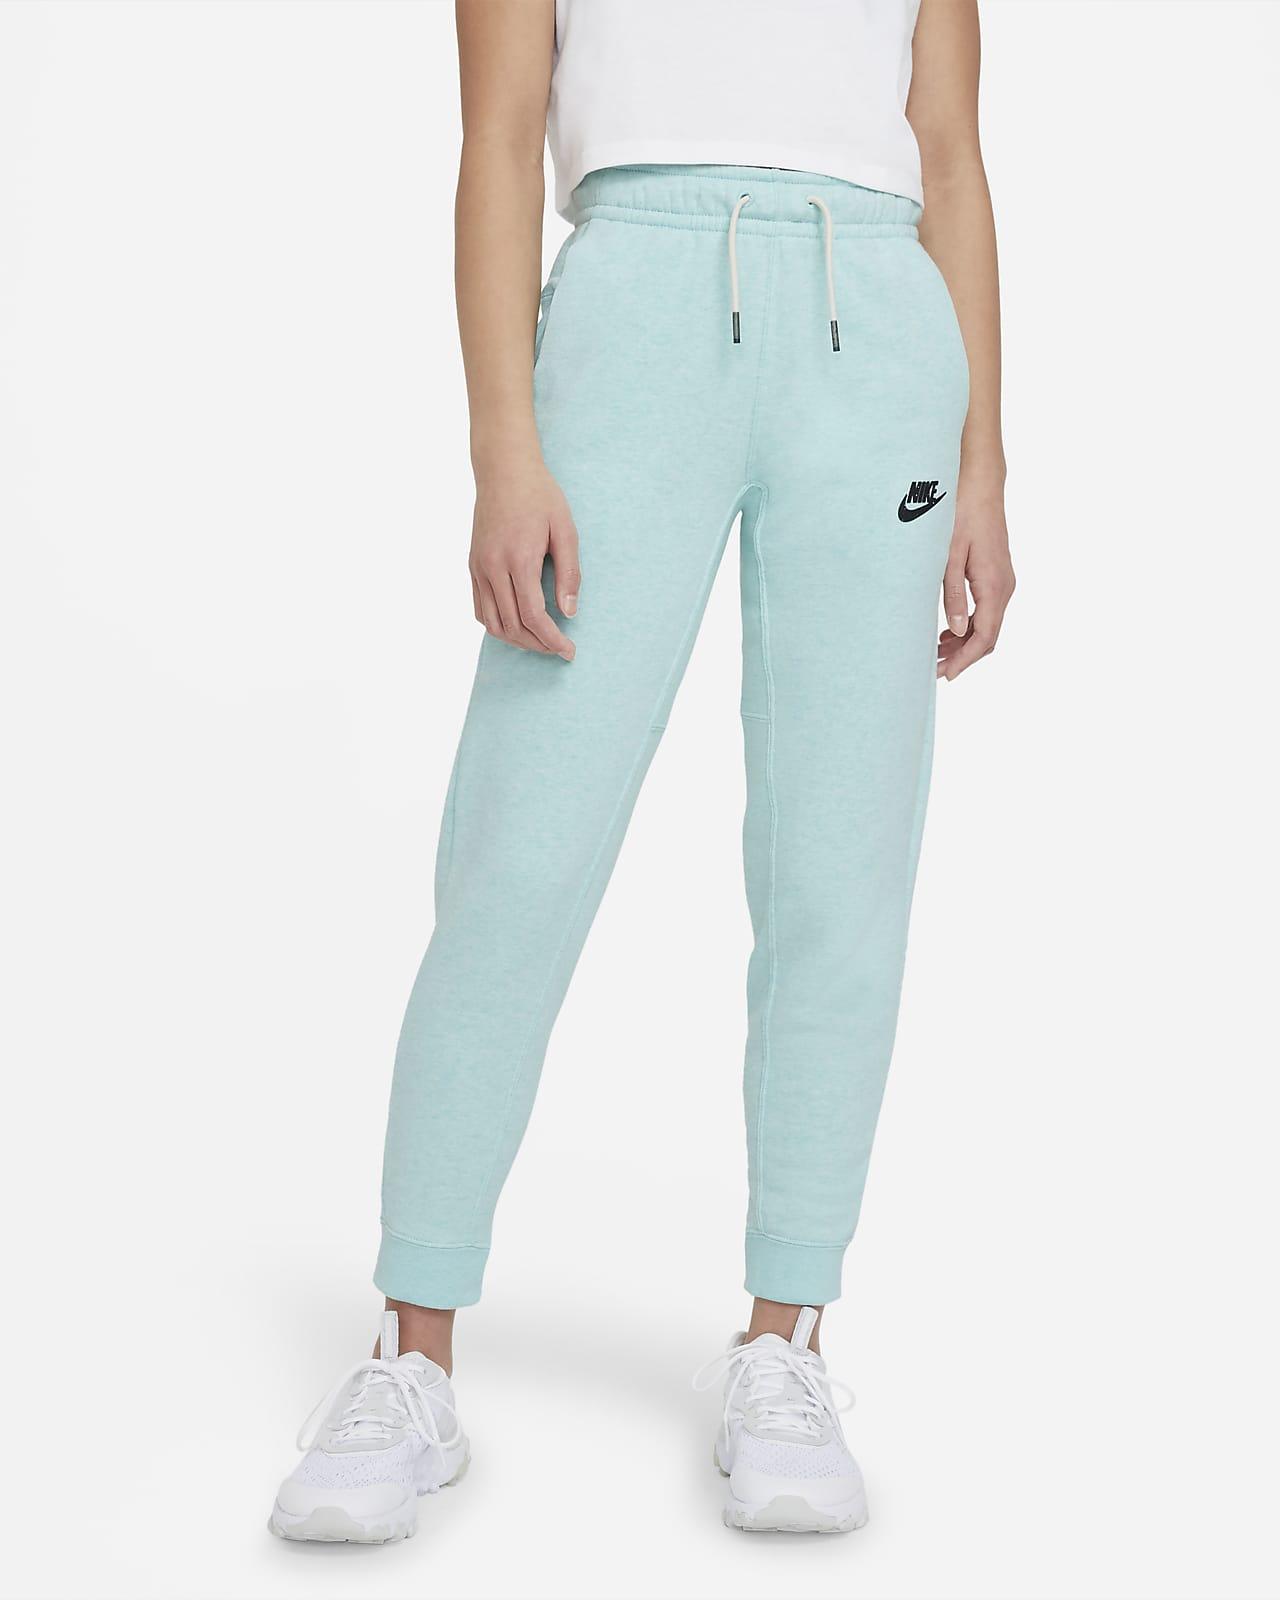 Pantalon de jogging Nike Sportswear Zero pour Enfant plus âgé